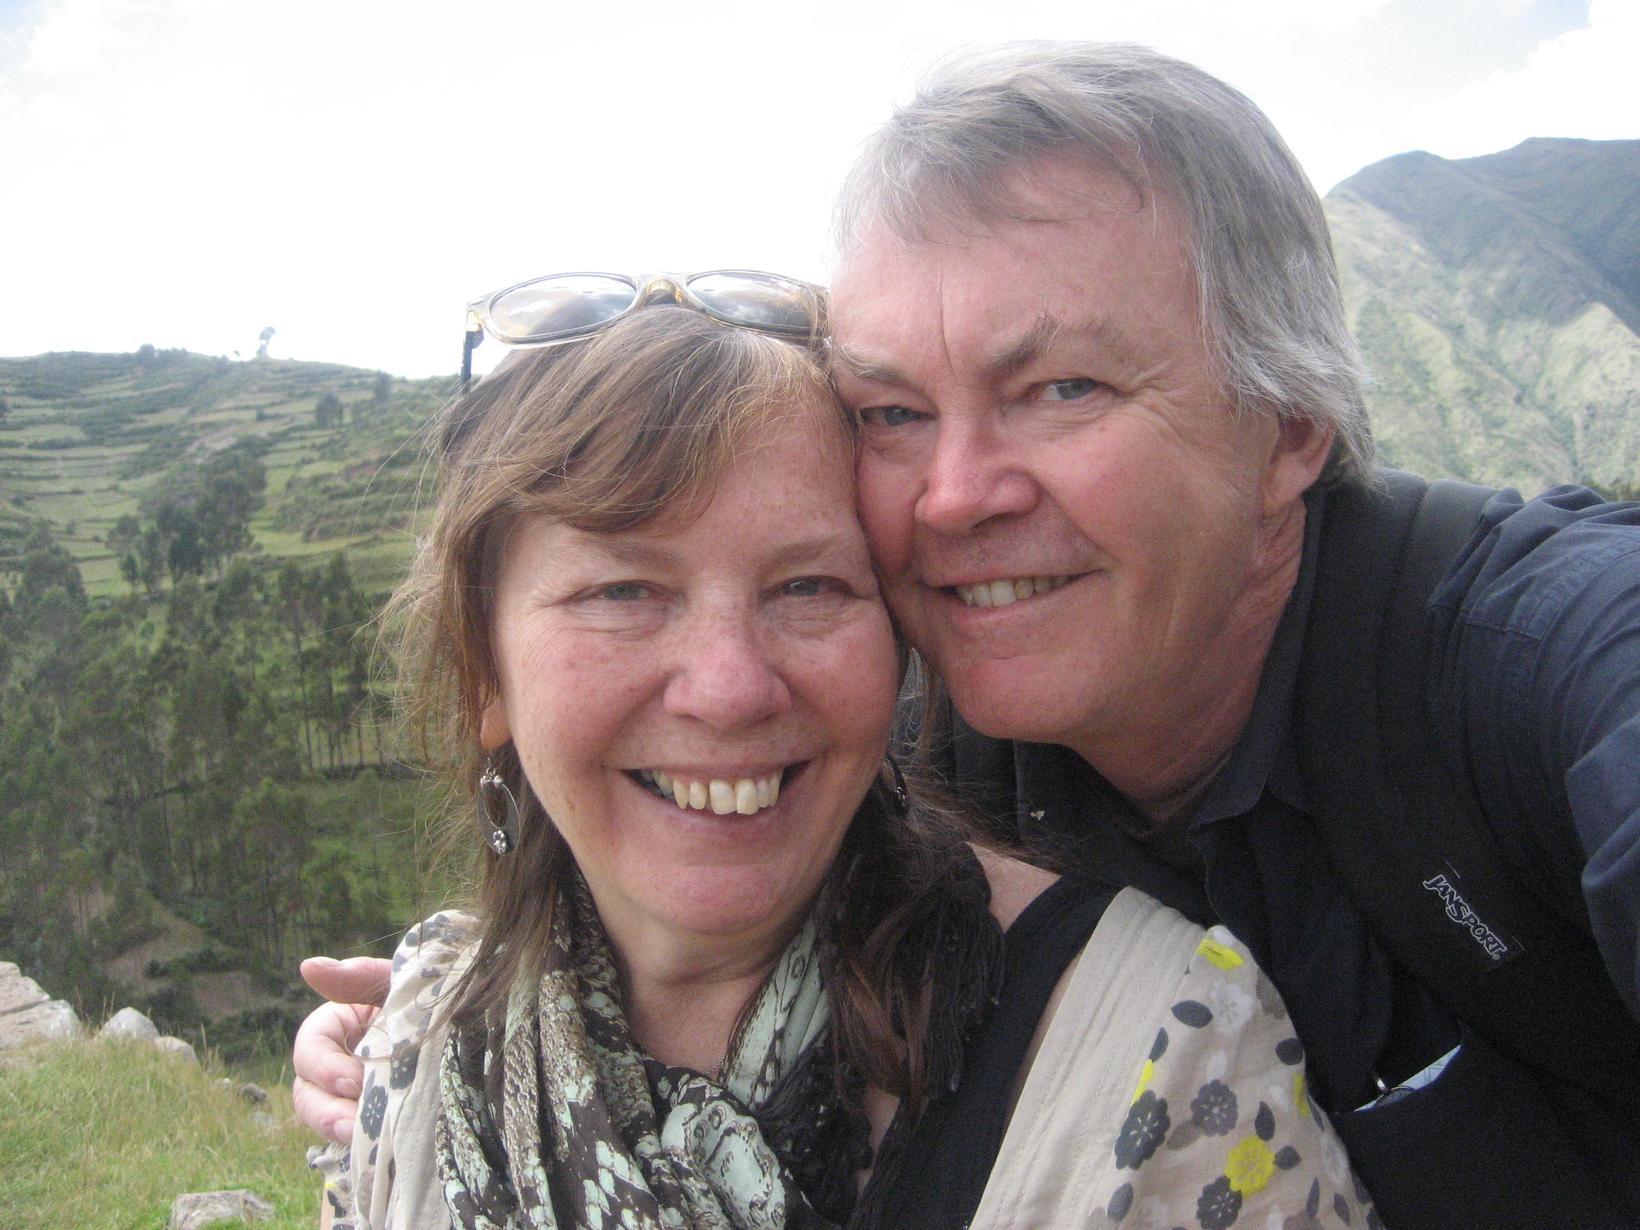 Robert & Rhonda from Portland, Oregon, United States